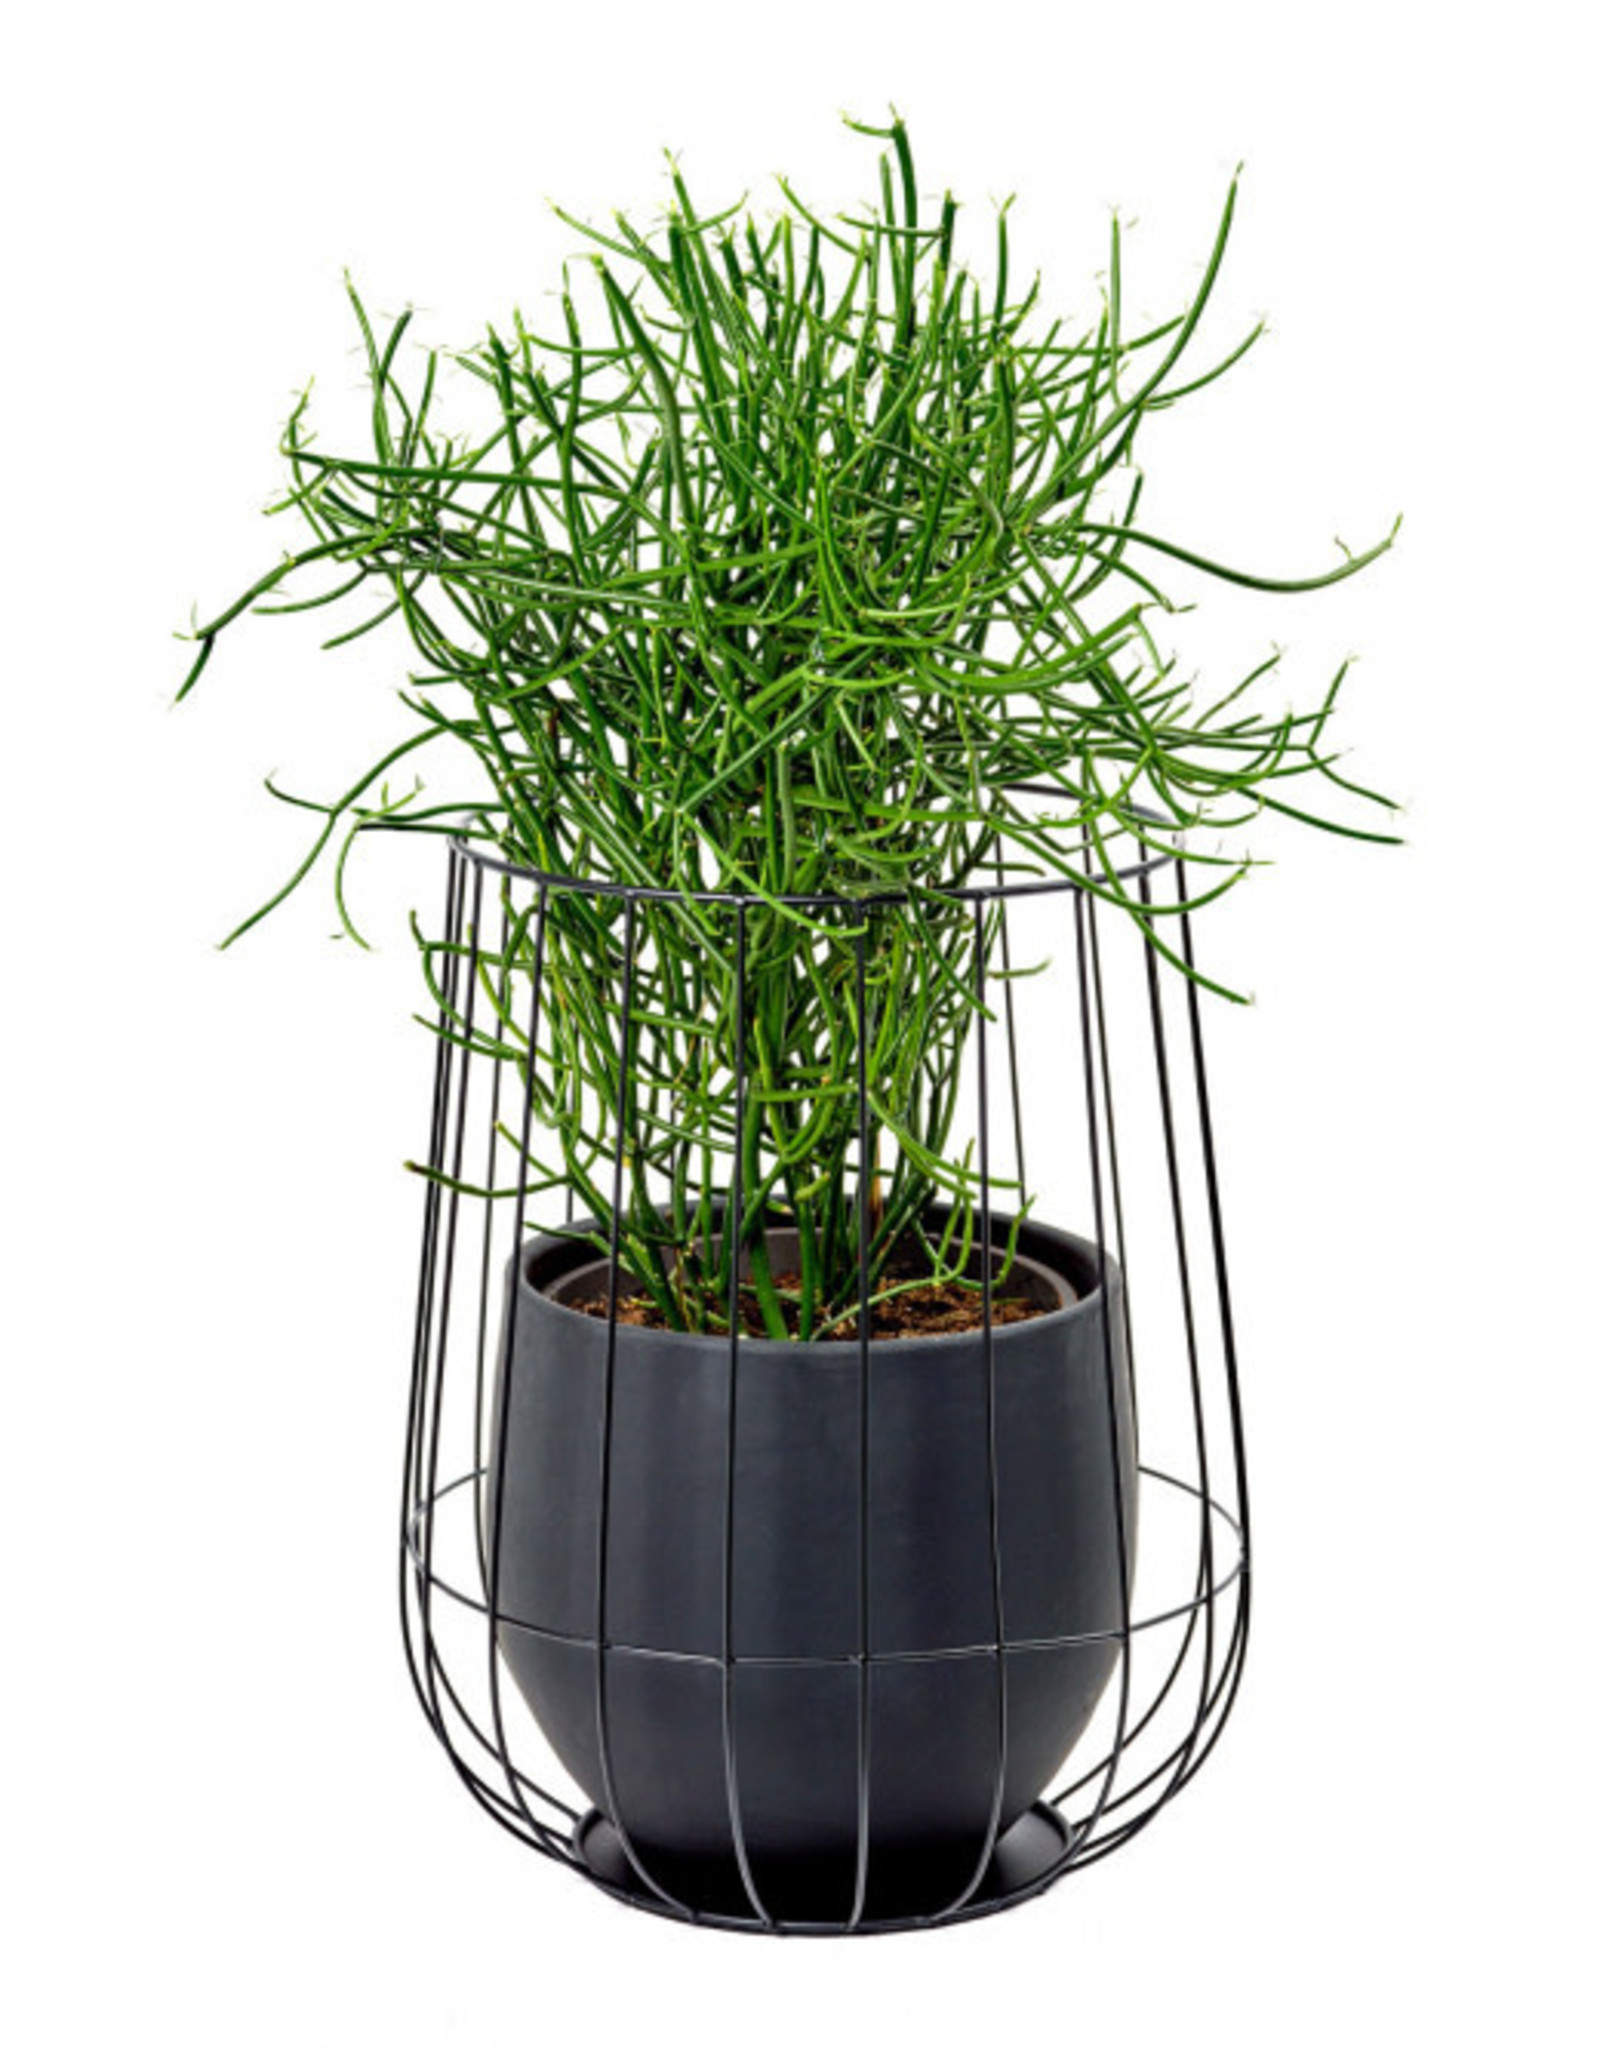 serax Pot in cage ∅37 - Black